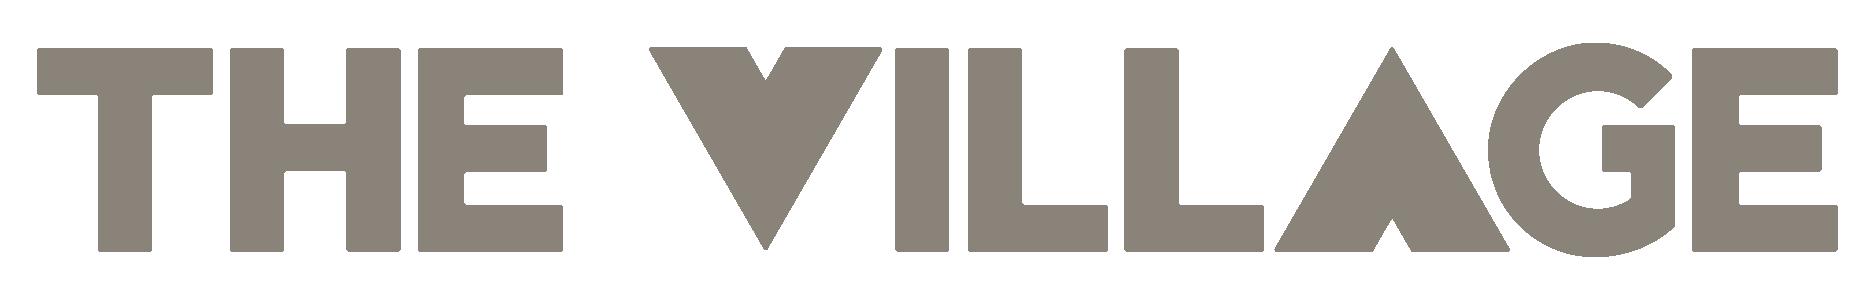 TheVillage_Logo_PMS403.png